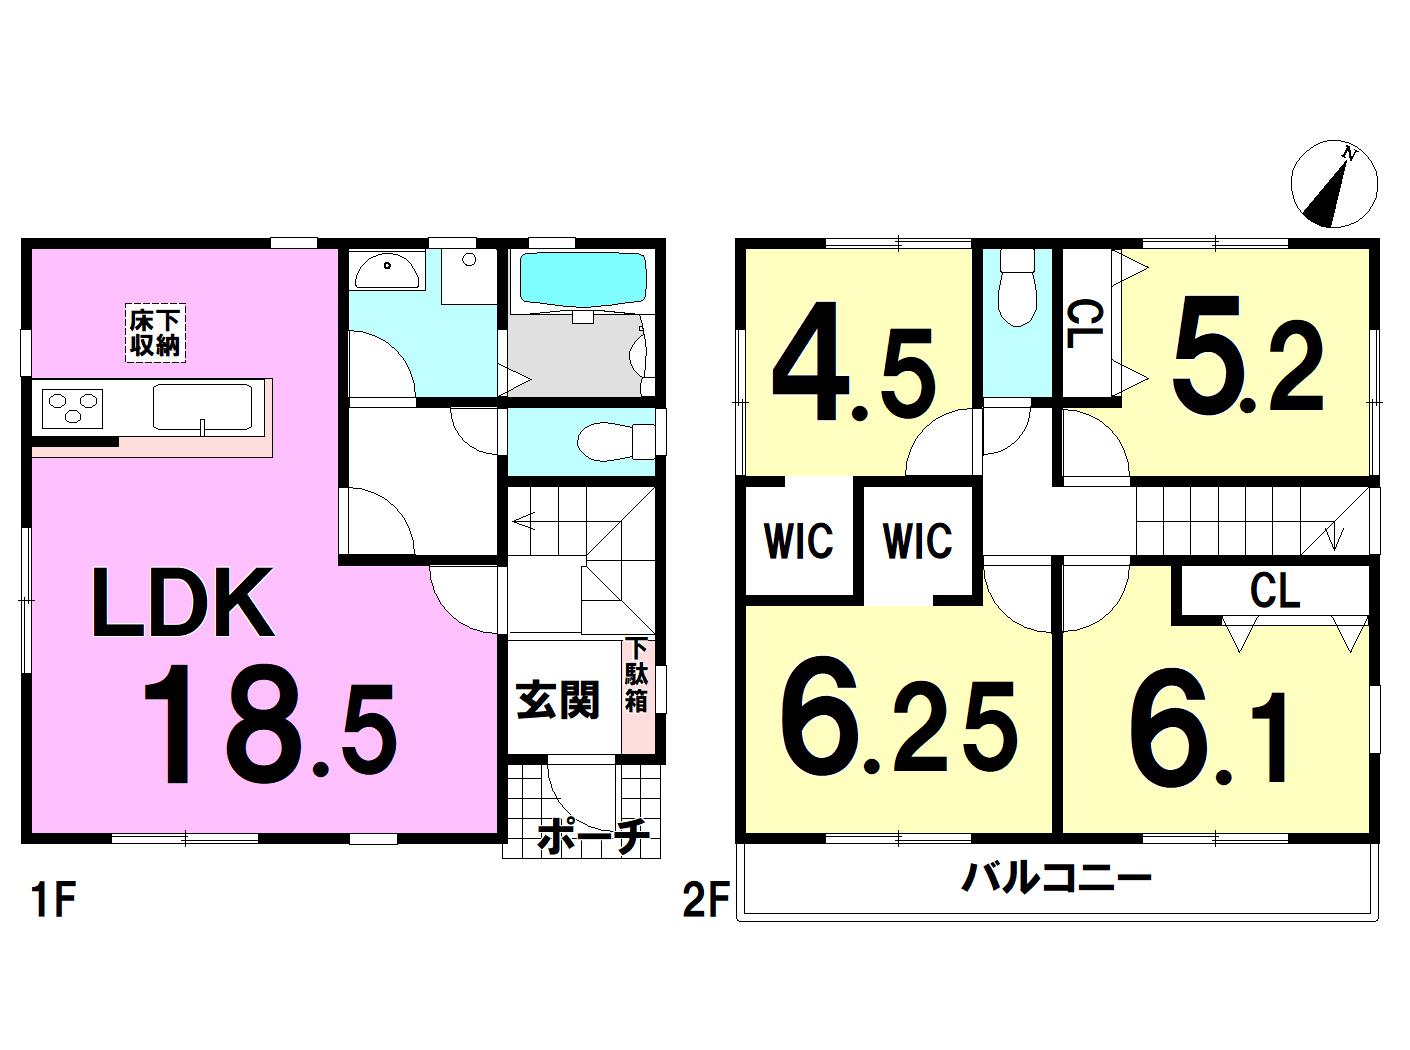 【間取り】 1F:18.5LDK 2F:6.25洋 61洋 5.2洋 4.5洋 WIC トイレ